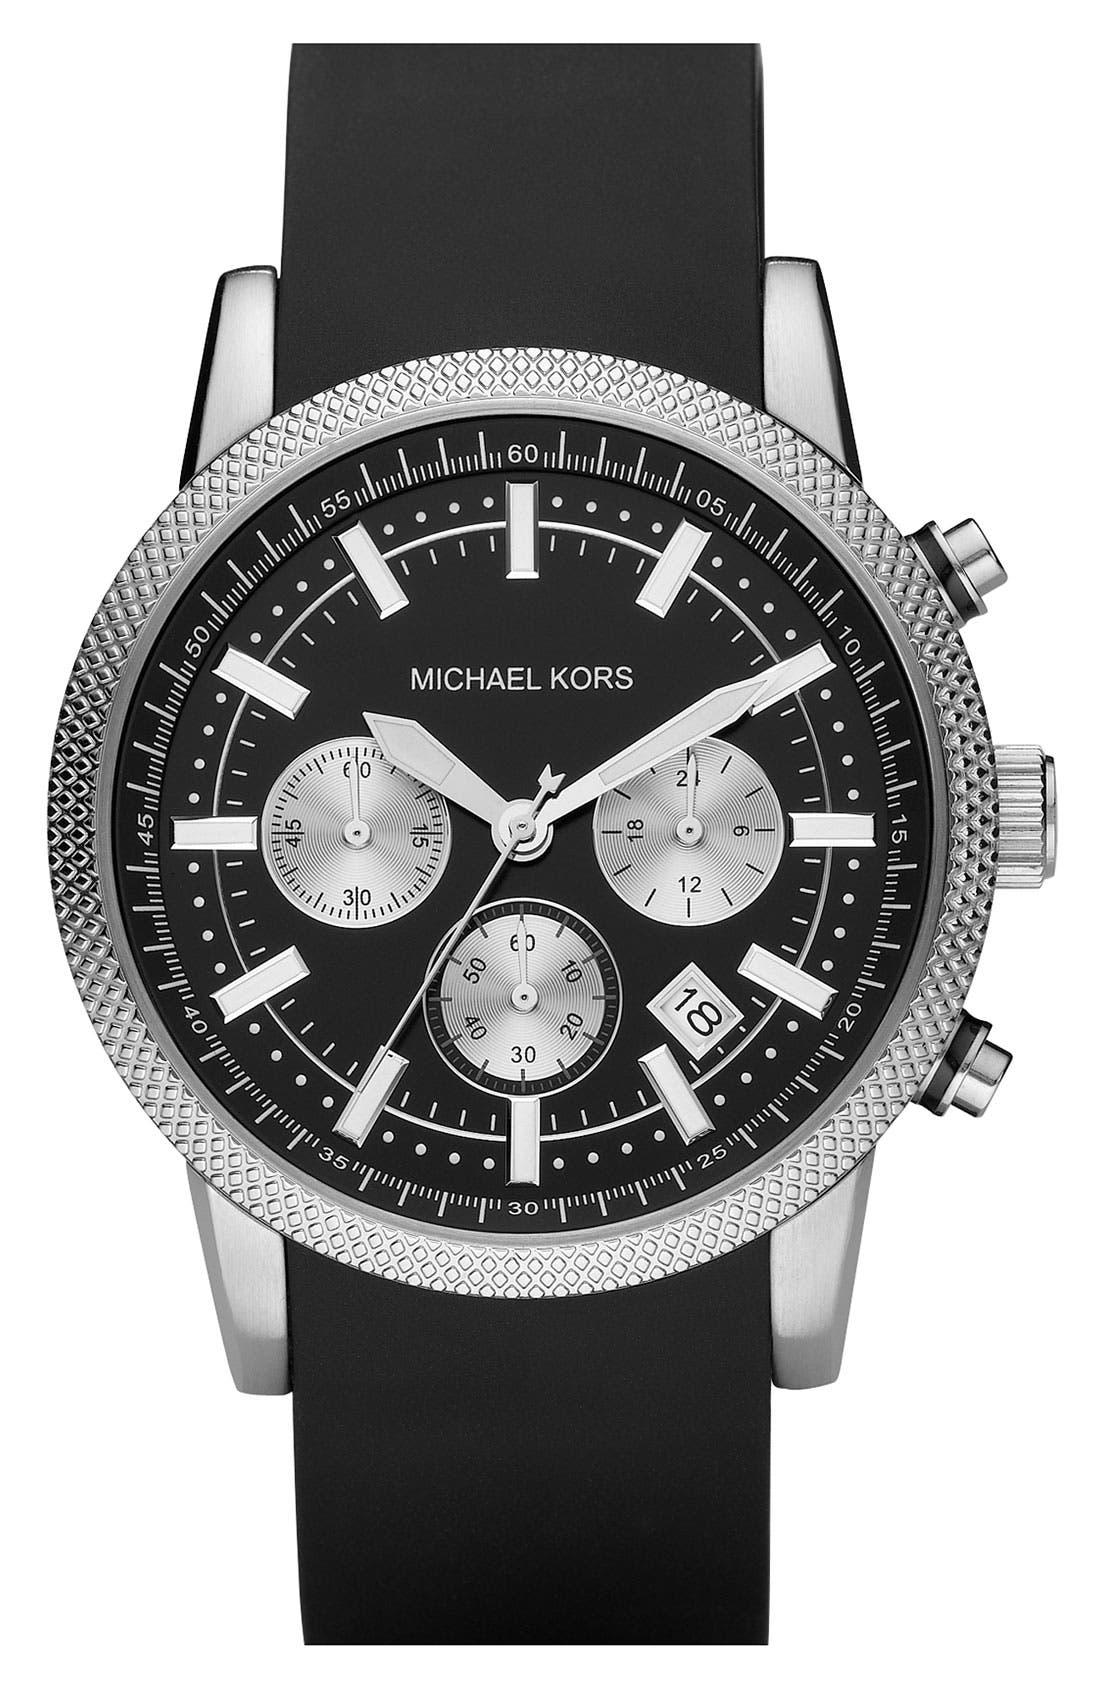 Main Image - Michael Kors 'Scout' Chronograph Watch, 43mm